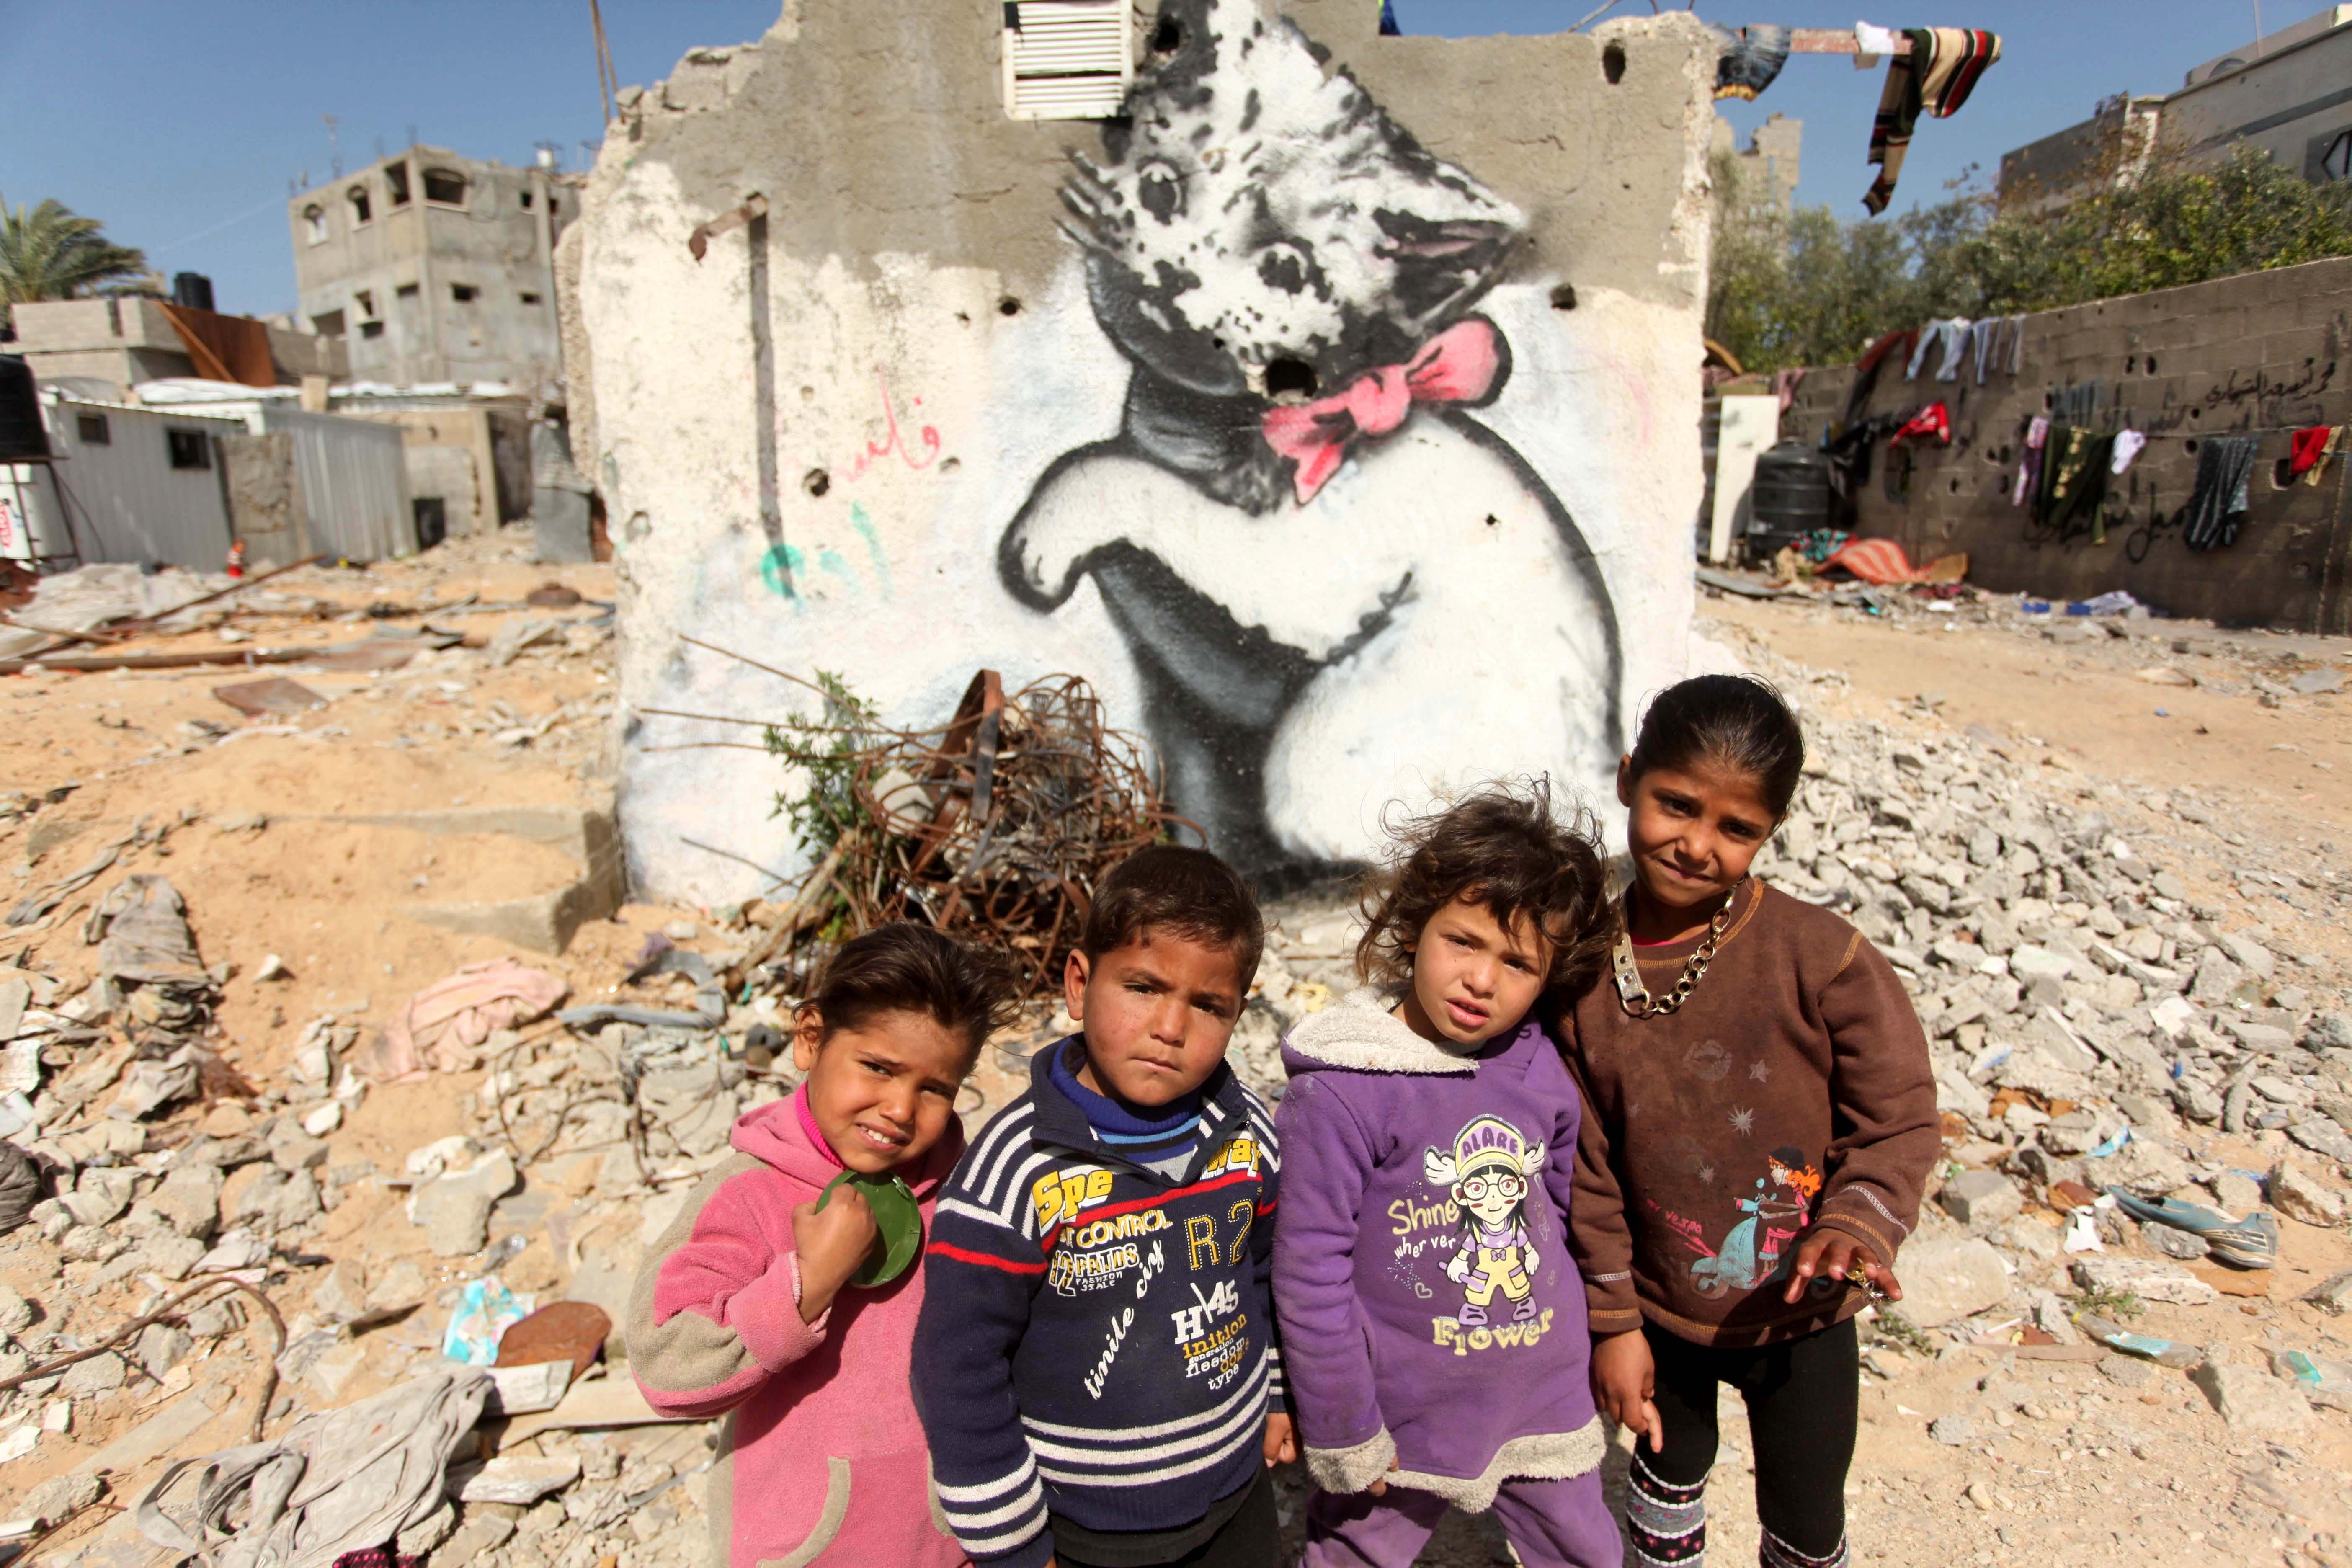 Gaza, i murales di Banksy